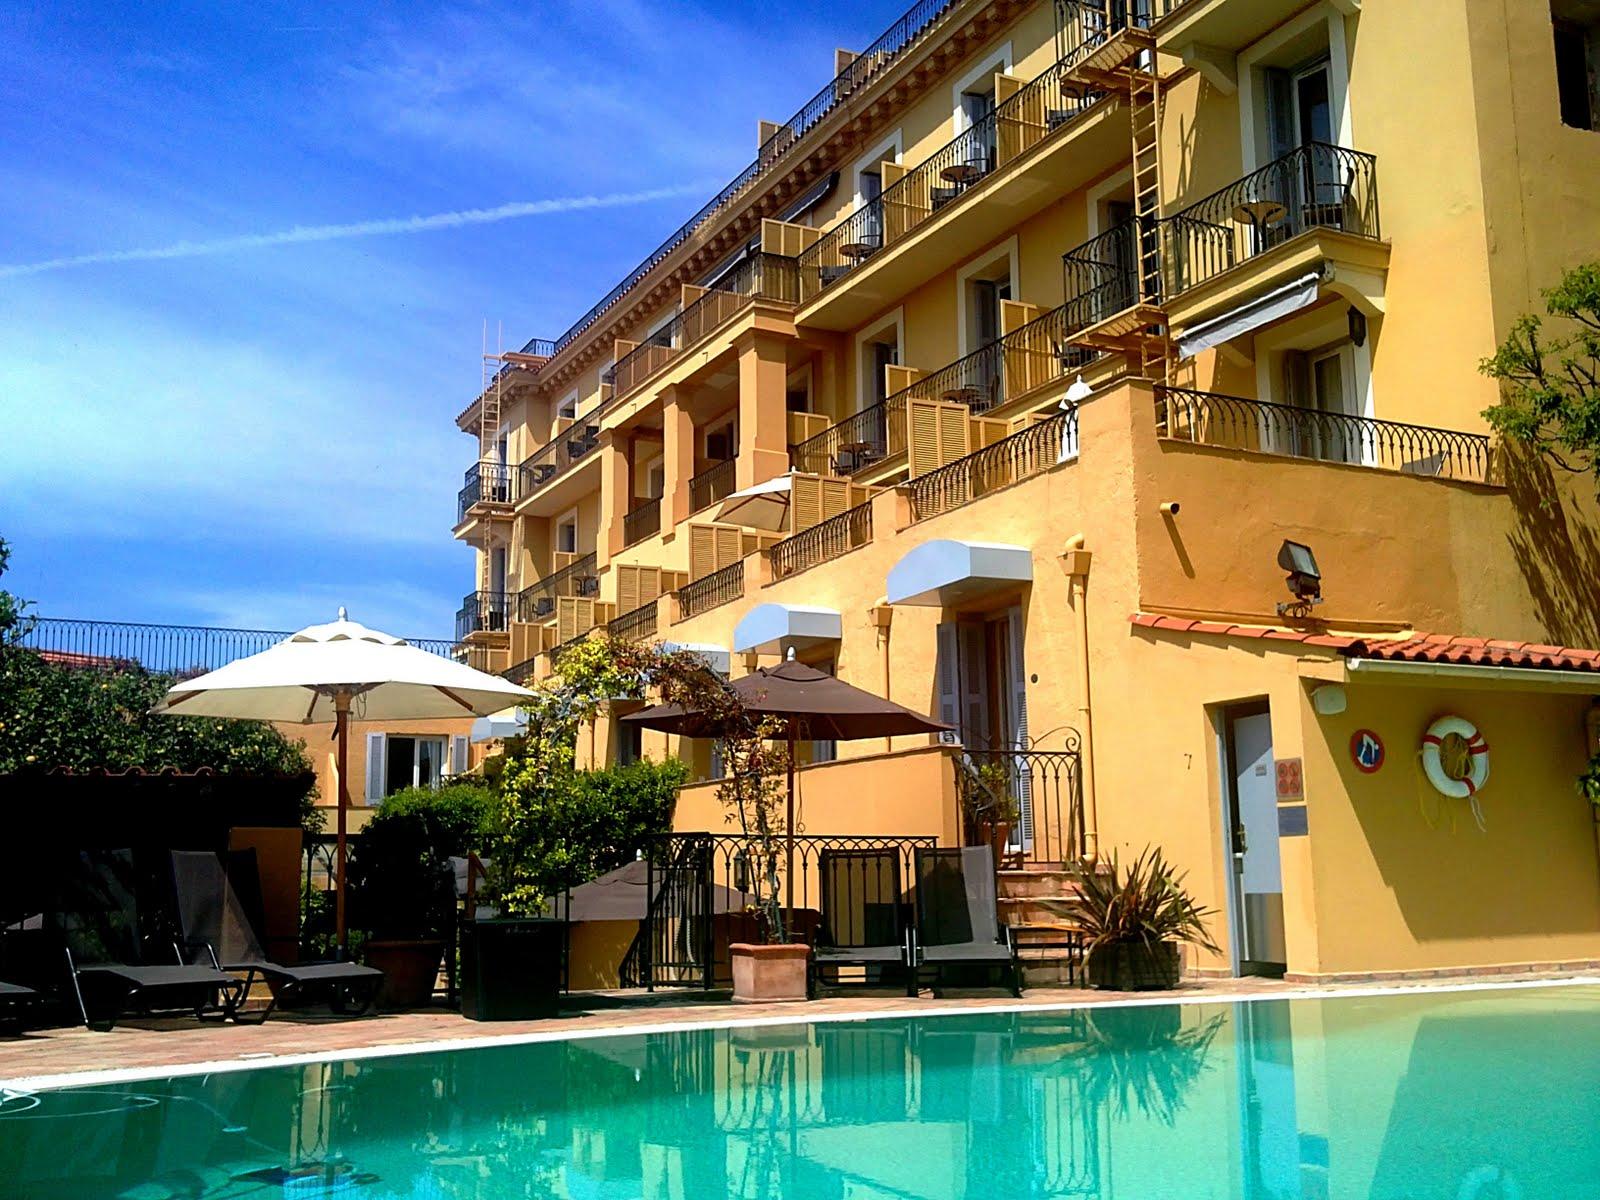 Keisuke matsushima notre partenariat avec l 39 h tel la for Nice hotel avec piscine